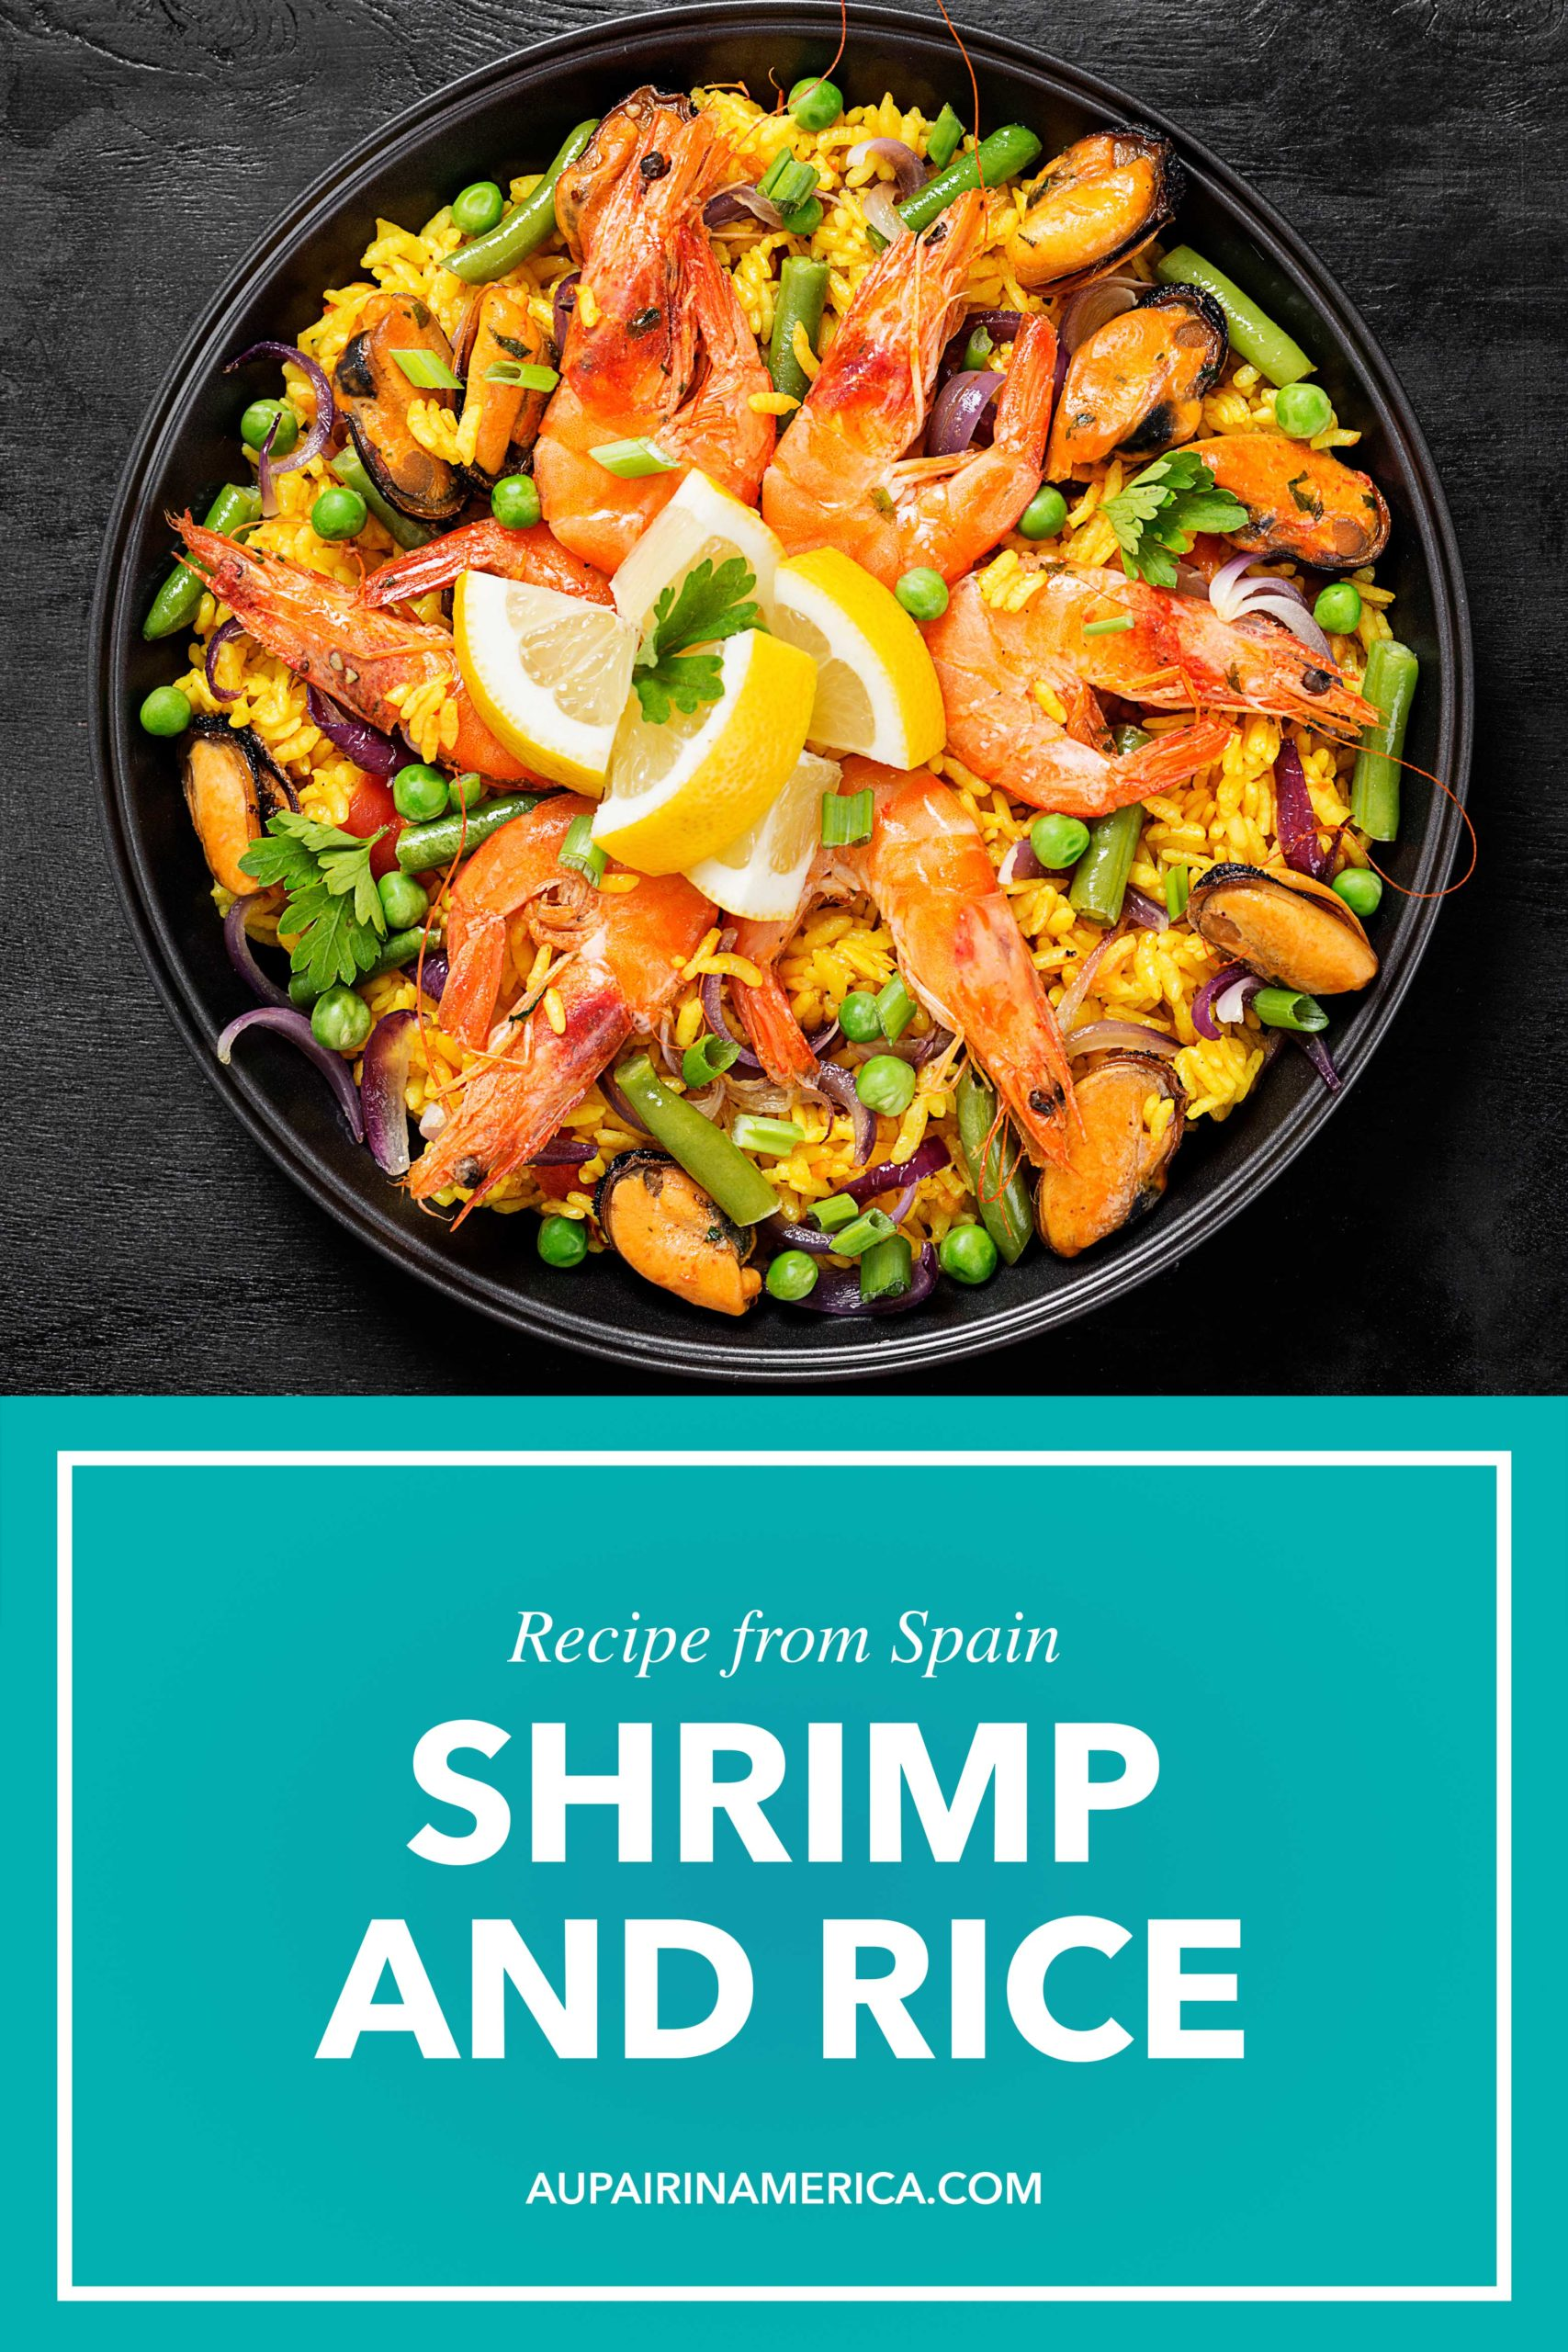 Spanish Shrimp and Rice